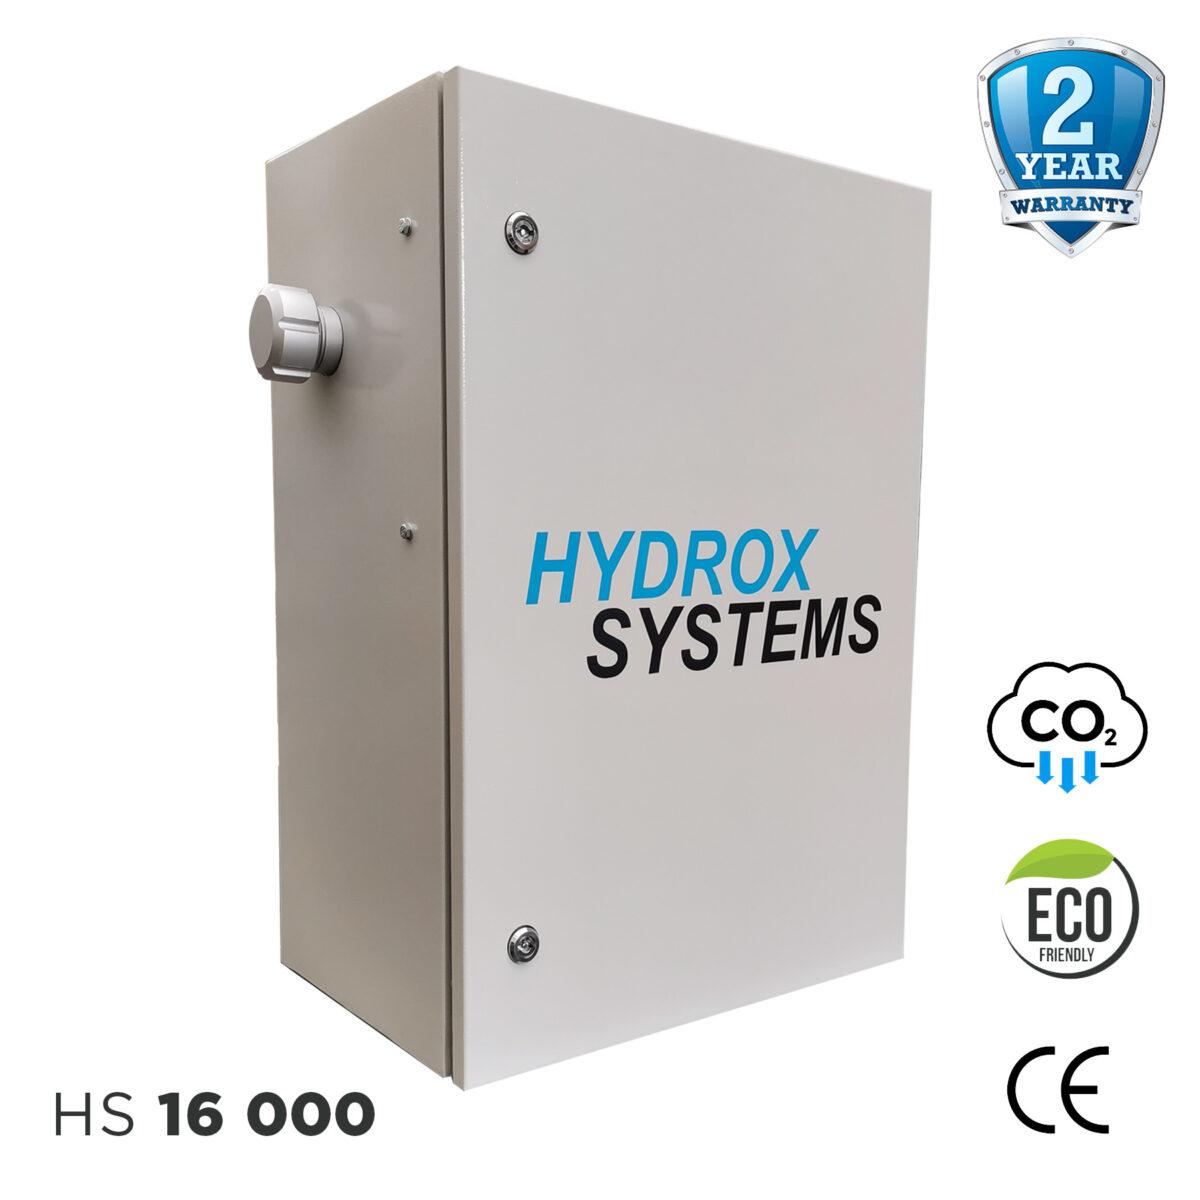 hho-kit-emission-reduction-for-bus